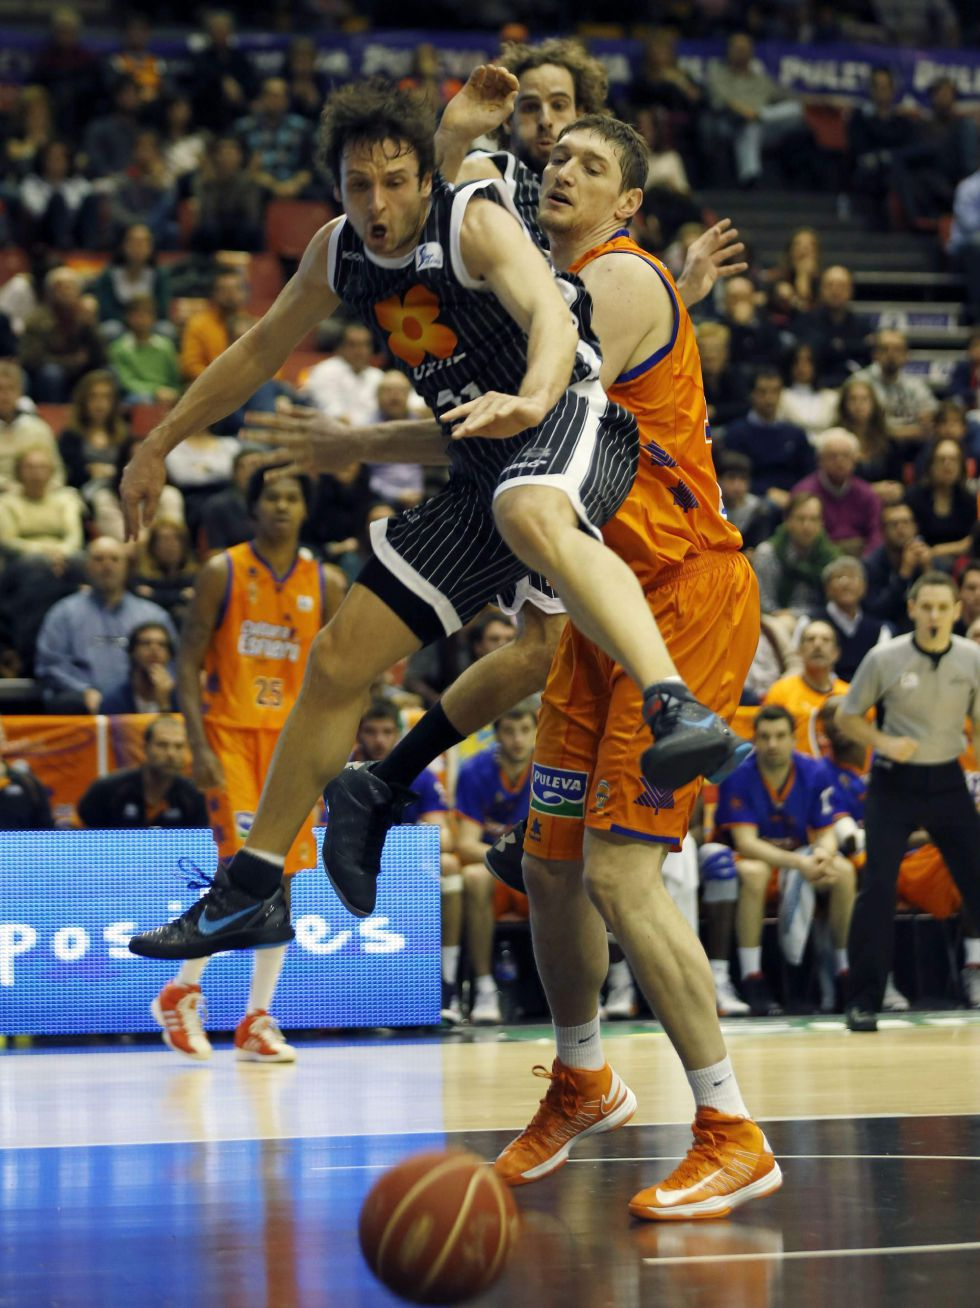 El Valencia doblega al Bilbao en la prórroga a base de tiros libres